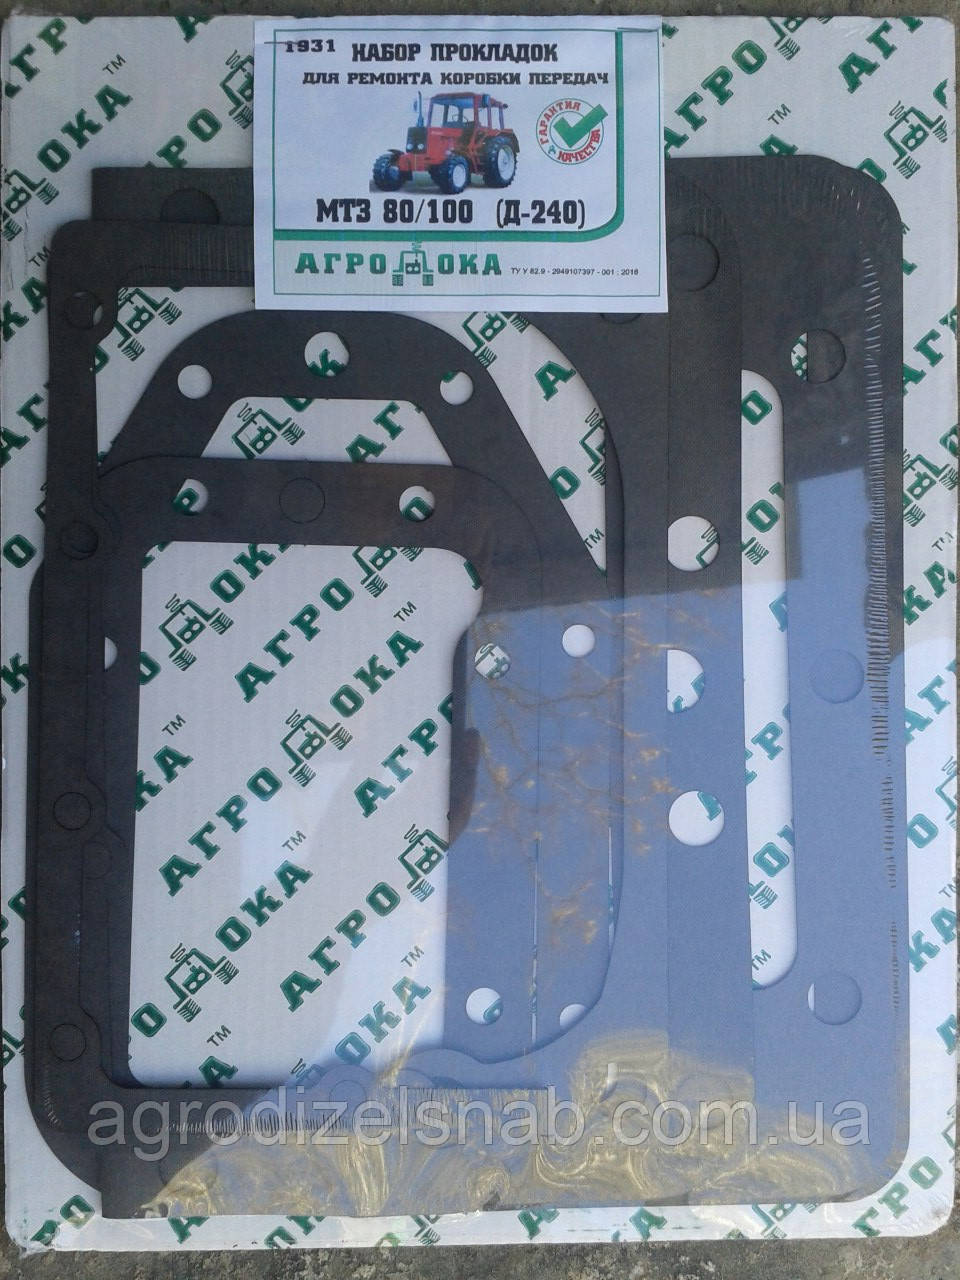 Набор прокладок КПП МТЗ (Д-240) (арт.1931)